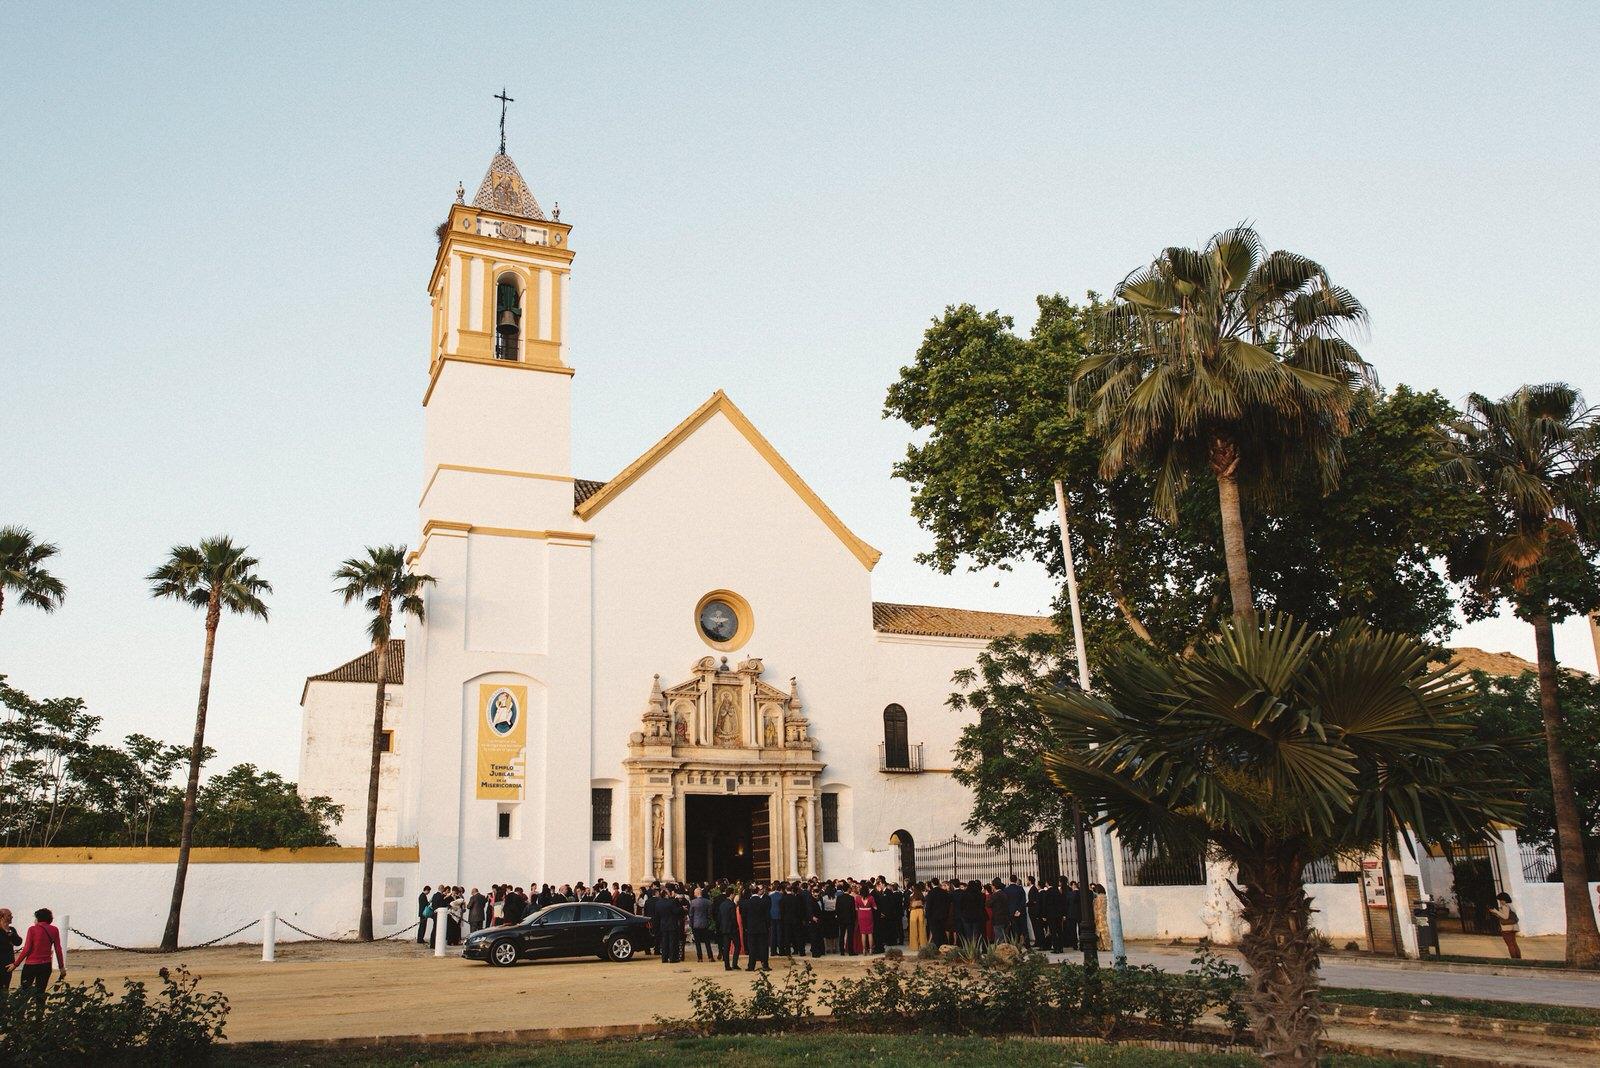 fotografo de bodas sevilla - fotografo boda - fotografía sevilla - Andrés AmarilloAAA_3209- fine.JPG